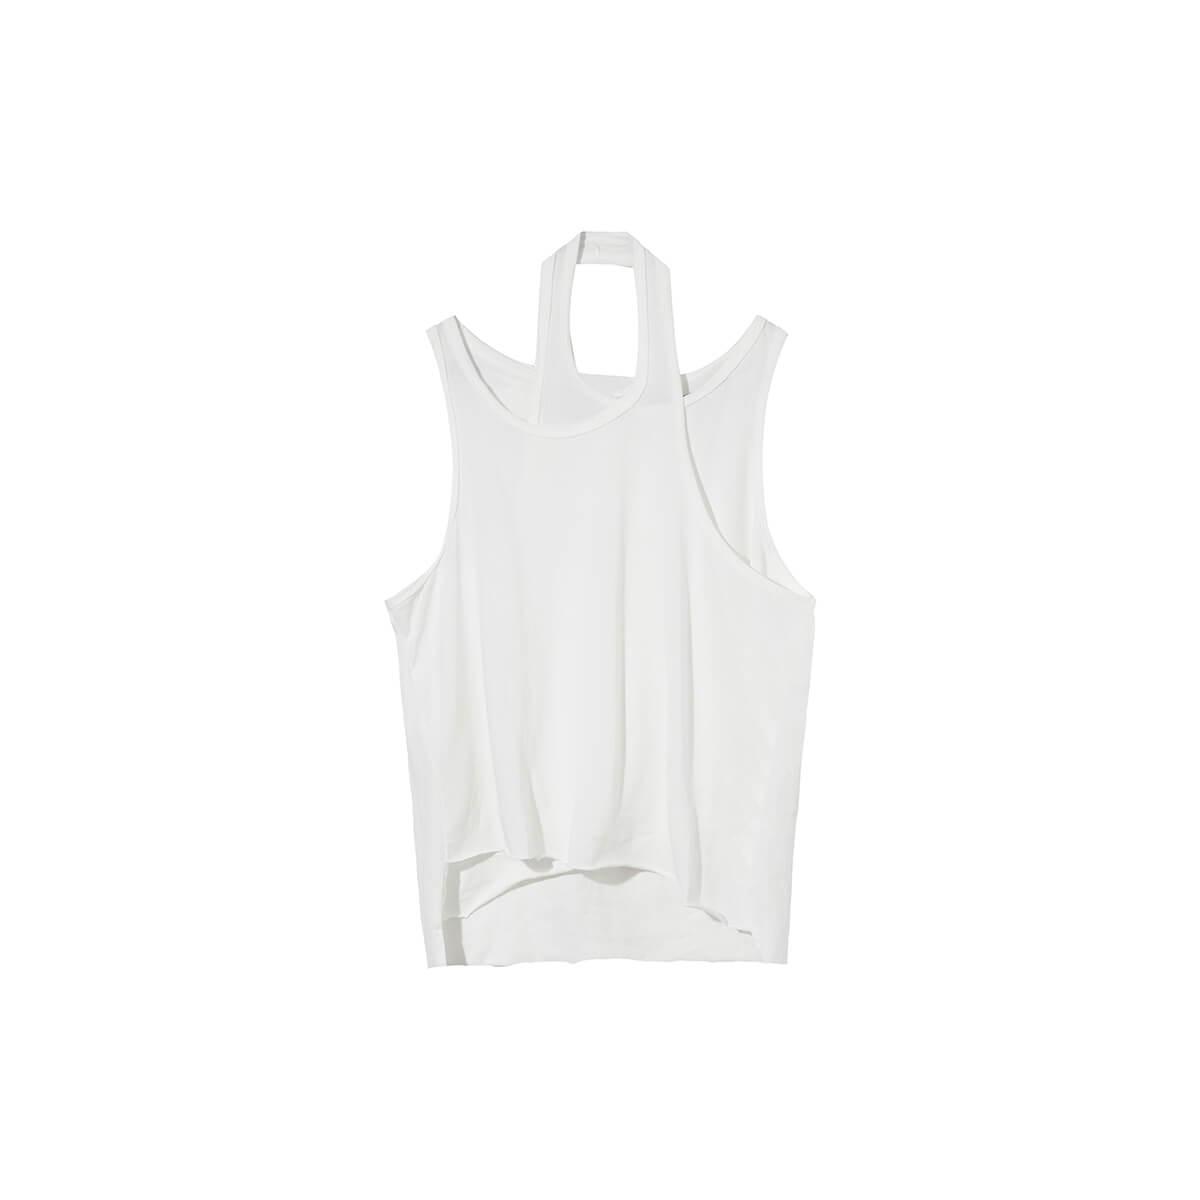 Майка Cui Layout Studio Designer Double Layer Tank Top White